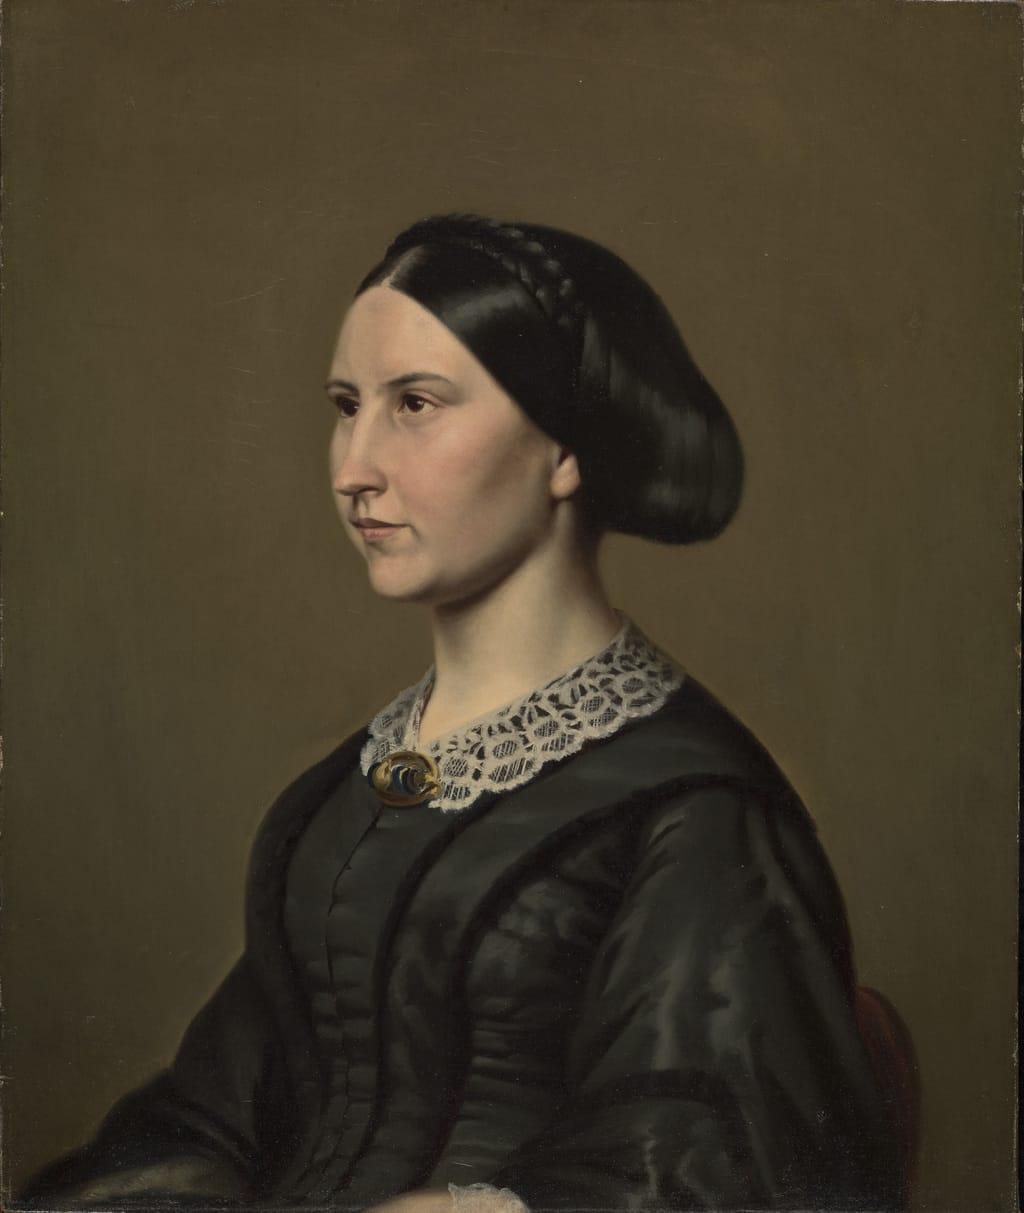 Madame Napoléon Bourassa, née Azélie Papineau